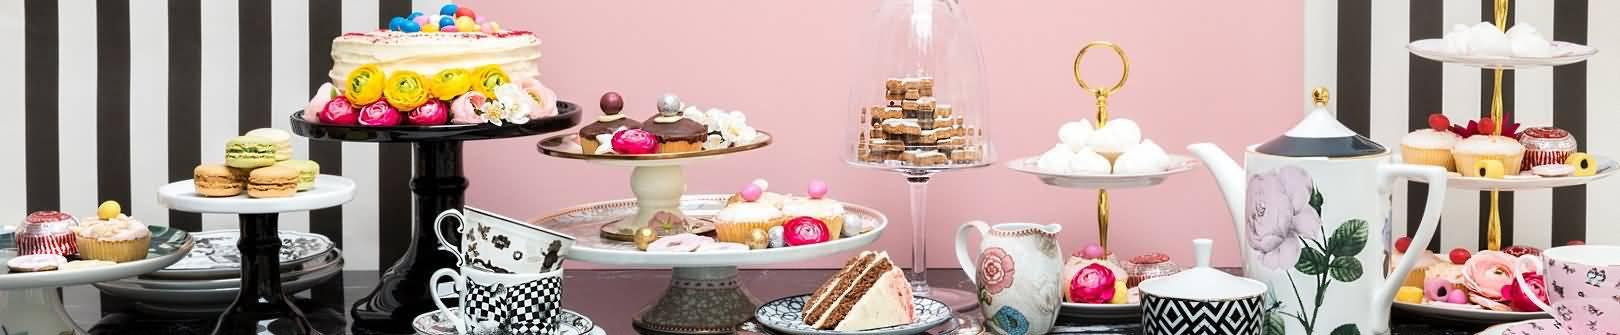 Supporti per torte